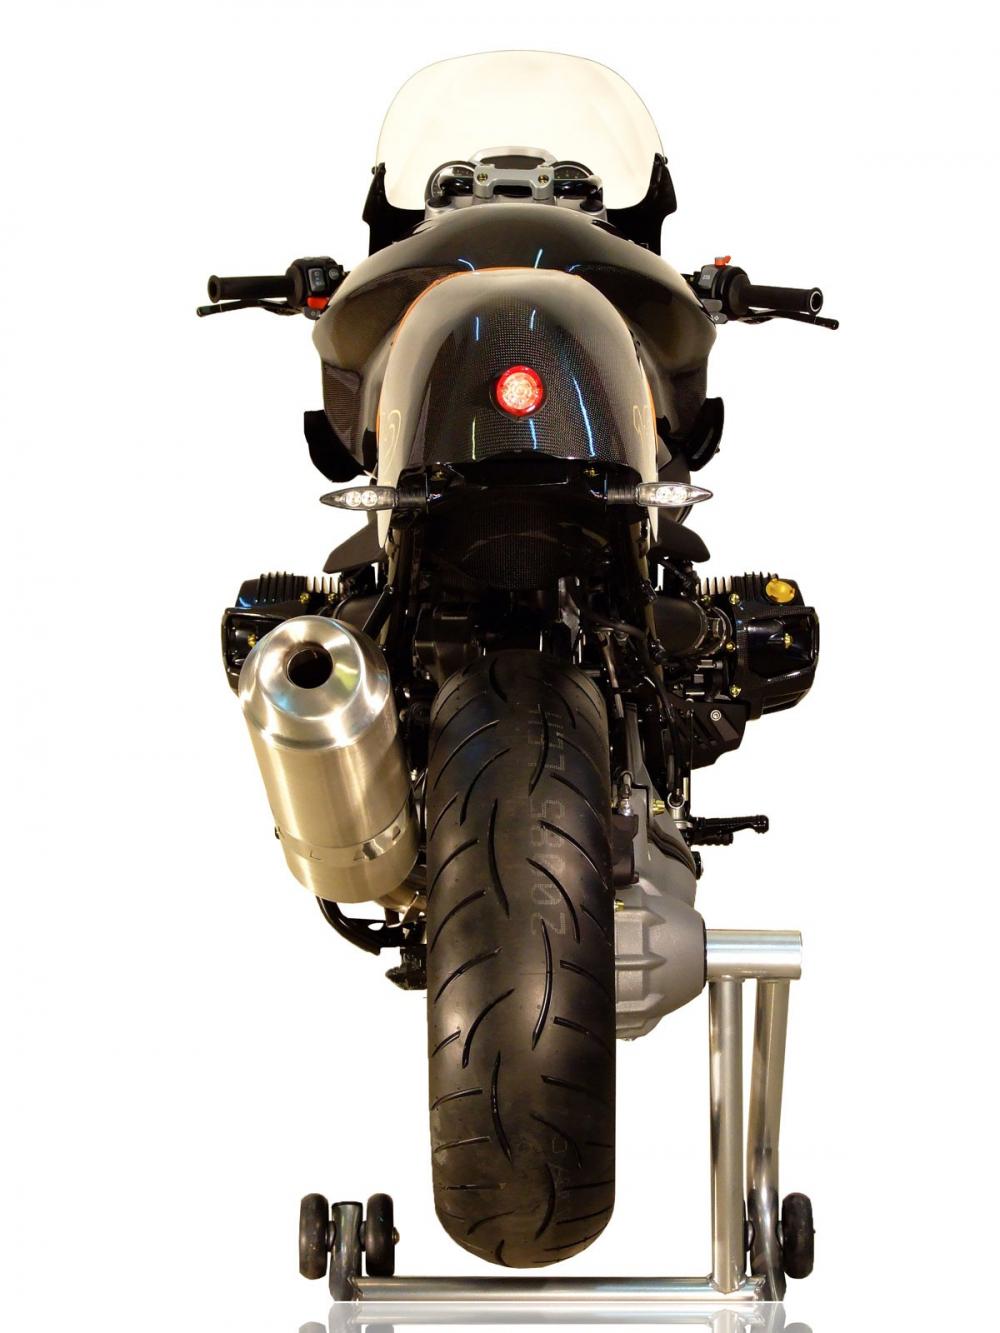 BMW R1200R man lot xac ngoan muc voi than hinh CAFE RACER hoan toan tu soi Carbon - 6